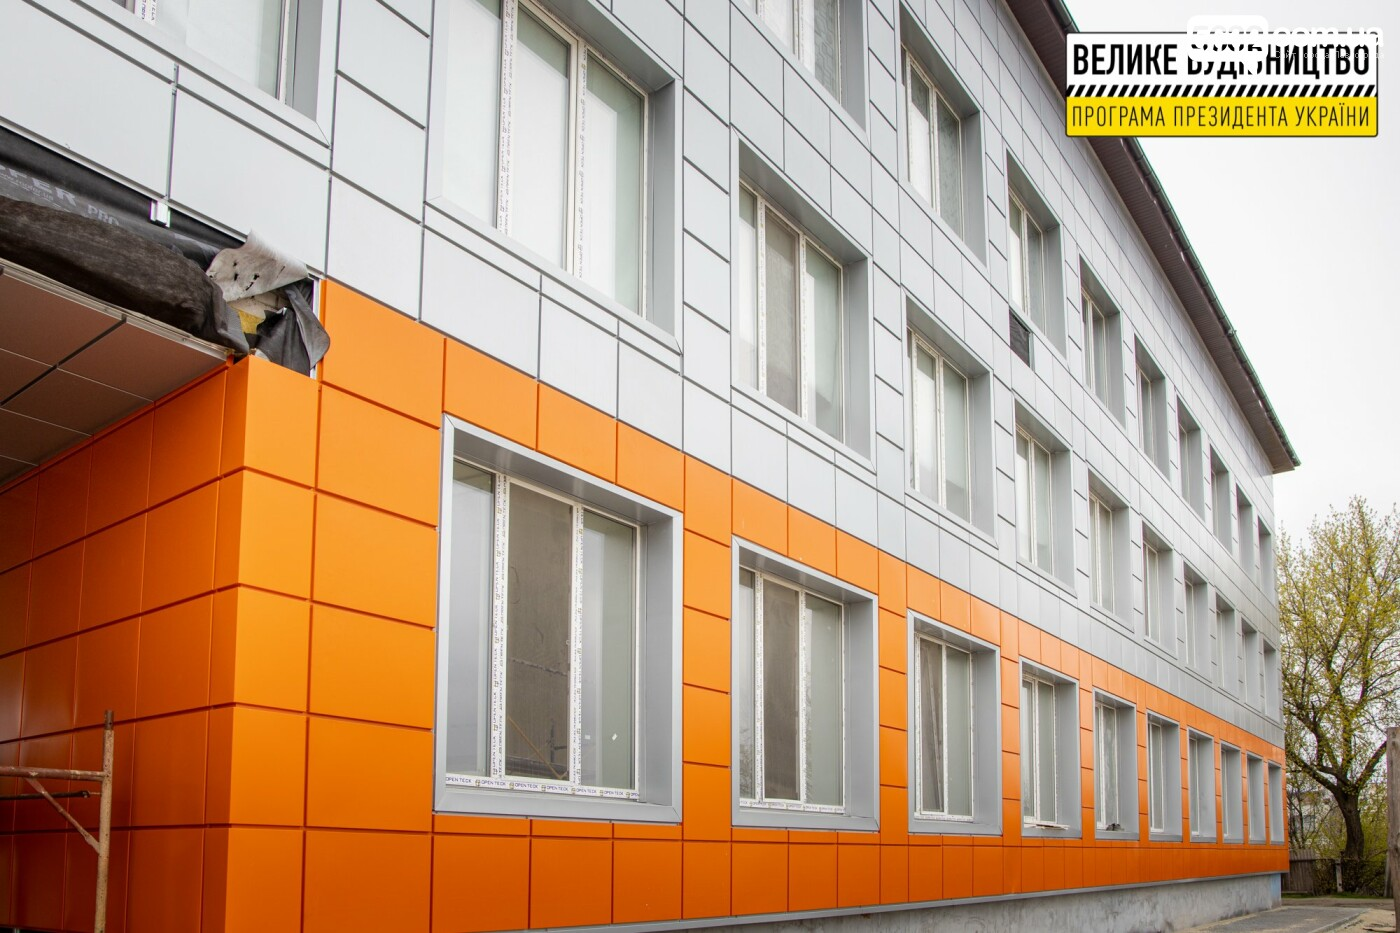 В Петропавловке модернизируют опорную школу (ФОТОРЕПОРТАЖ), фото-6